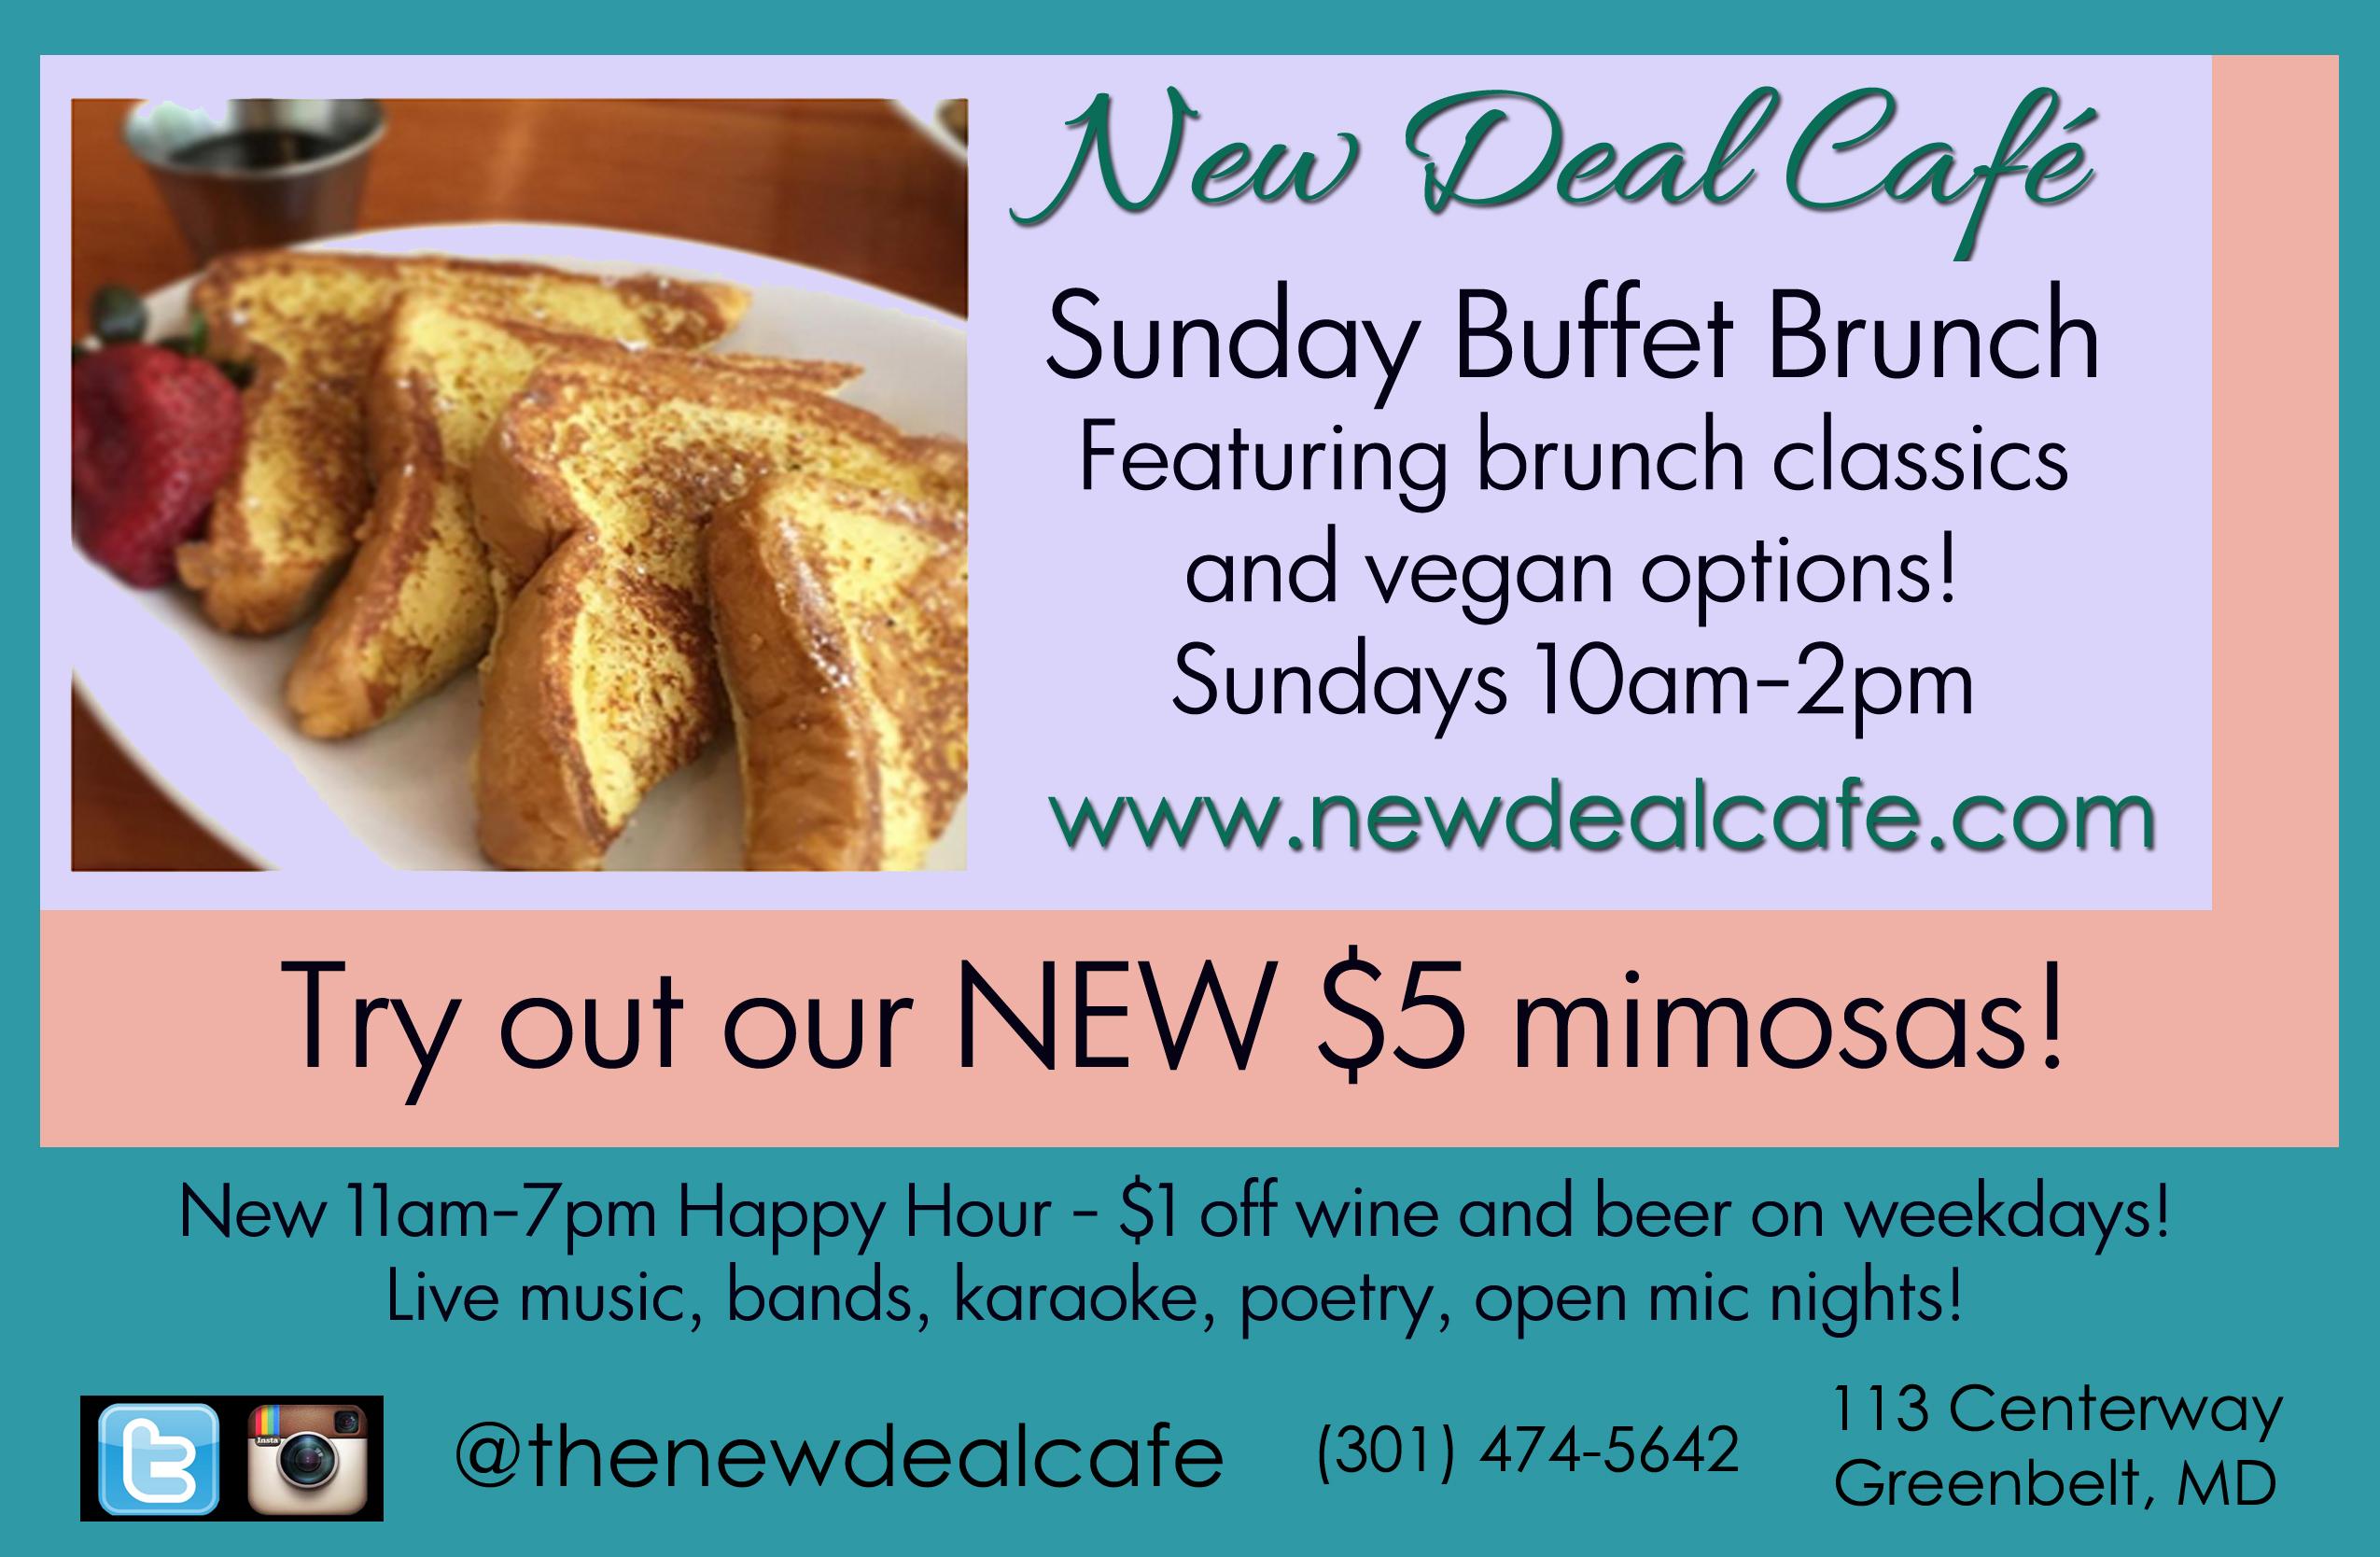 brunch buffet at new deal cafe – new deal cafe